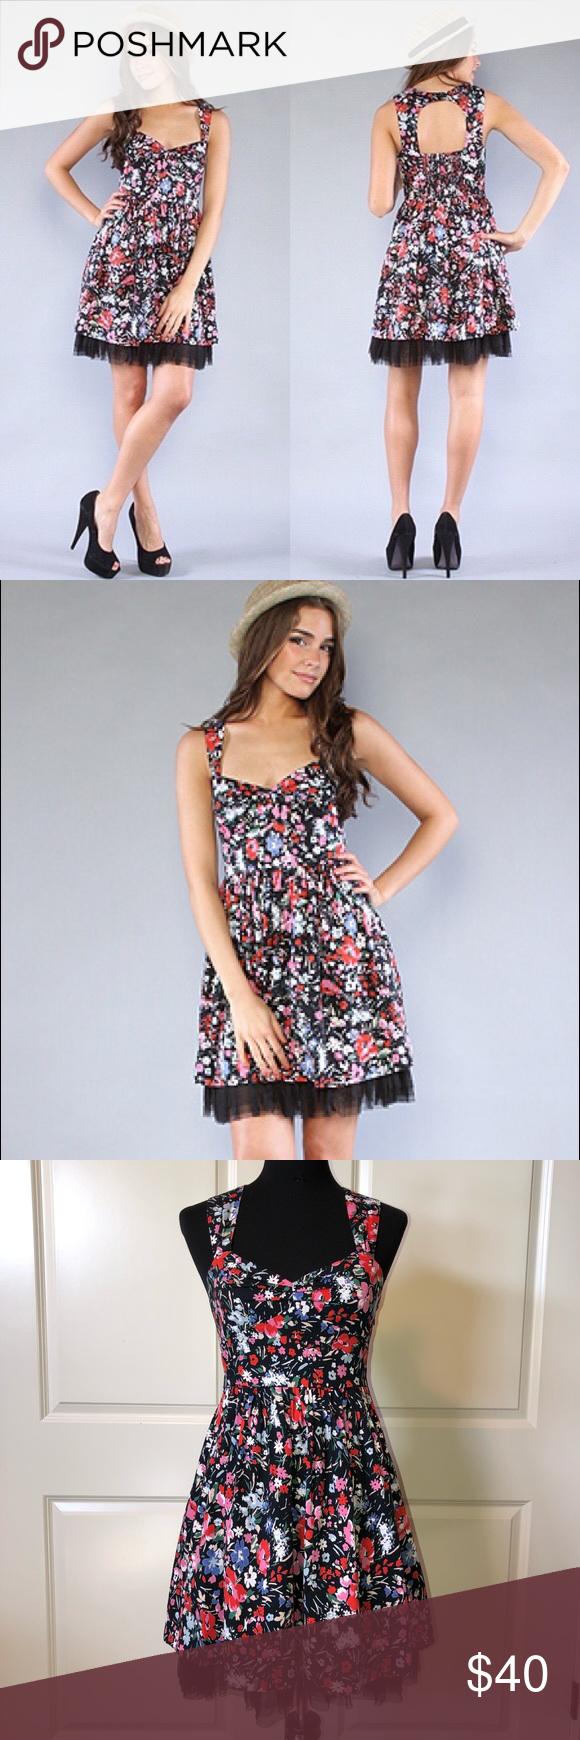 Free People Floral Sunkissed Summer Dress Summer Dresses Clothes Design Dresses [ 1740 x 580 Pixel ]